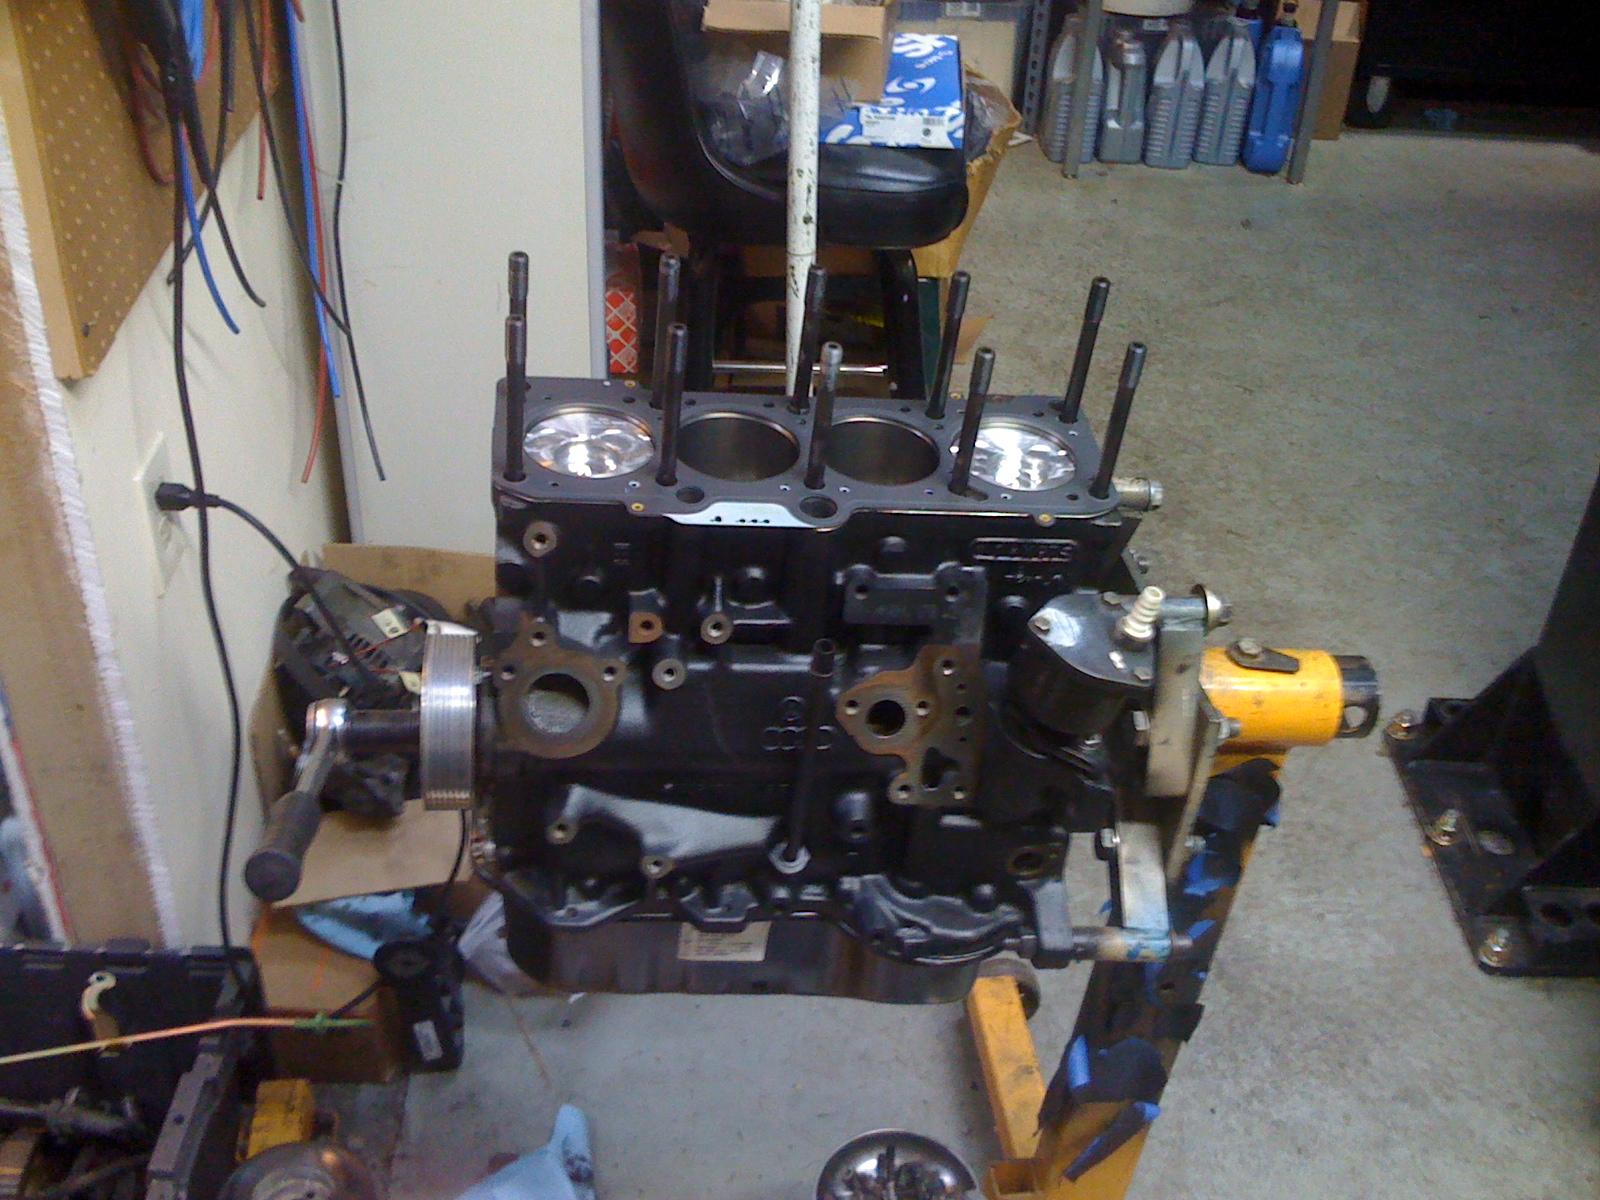 Grease Works shop notes: Eurovan 4-cyl AHU TDI engine